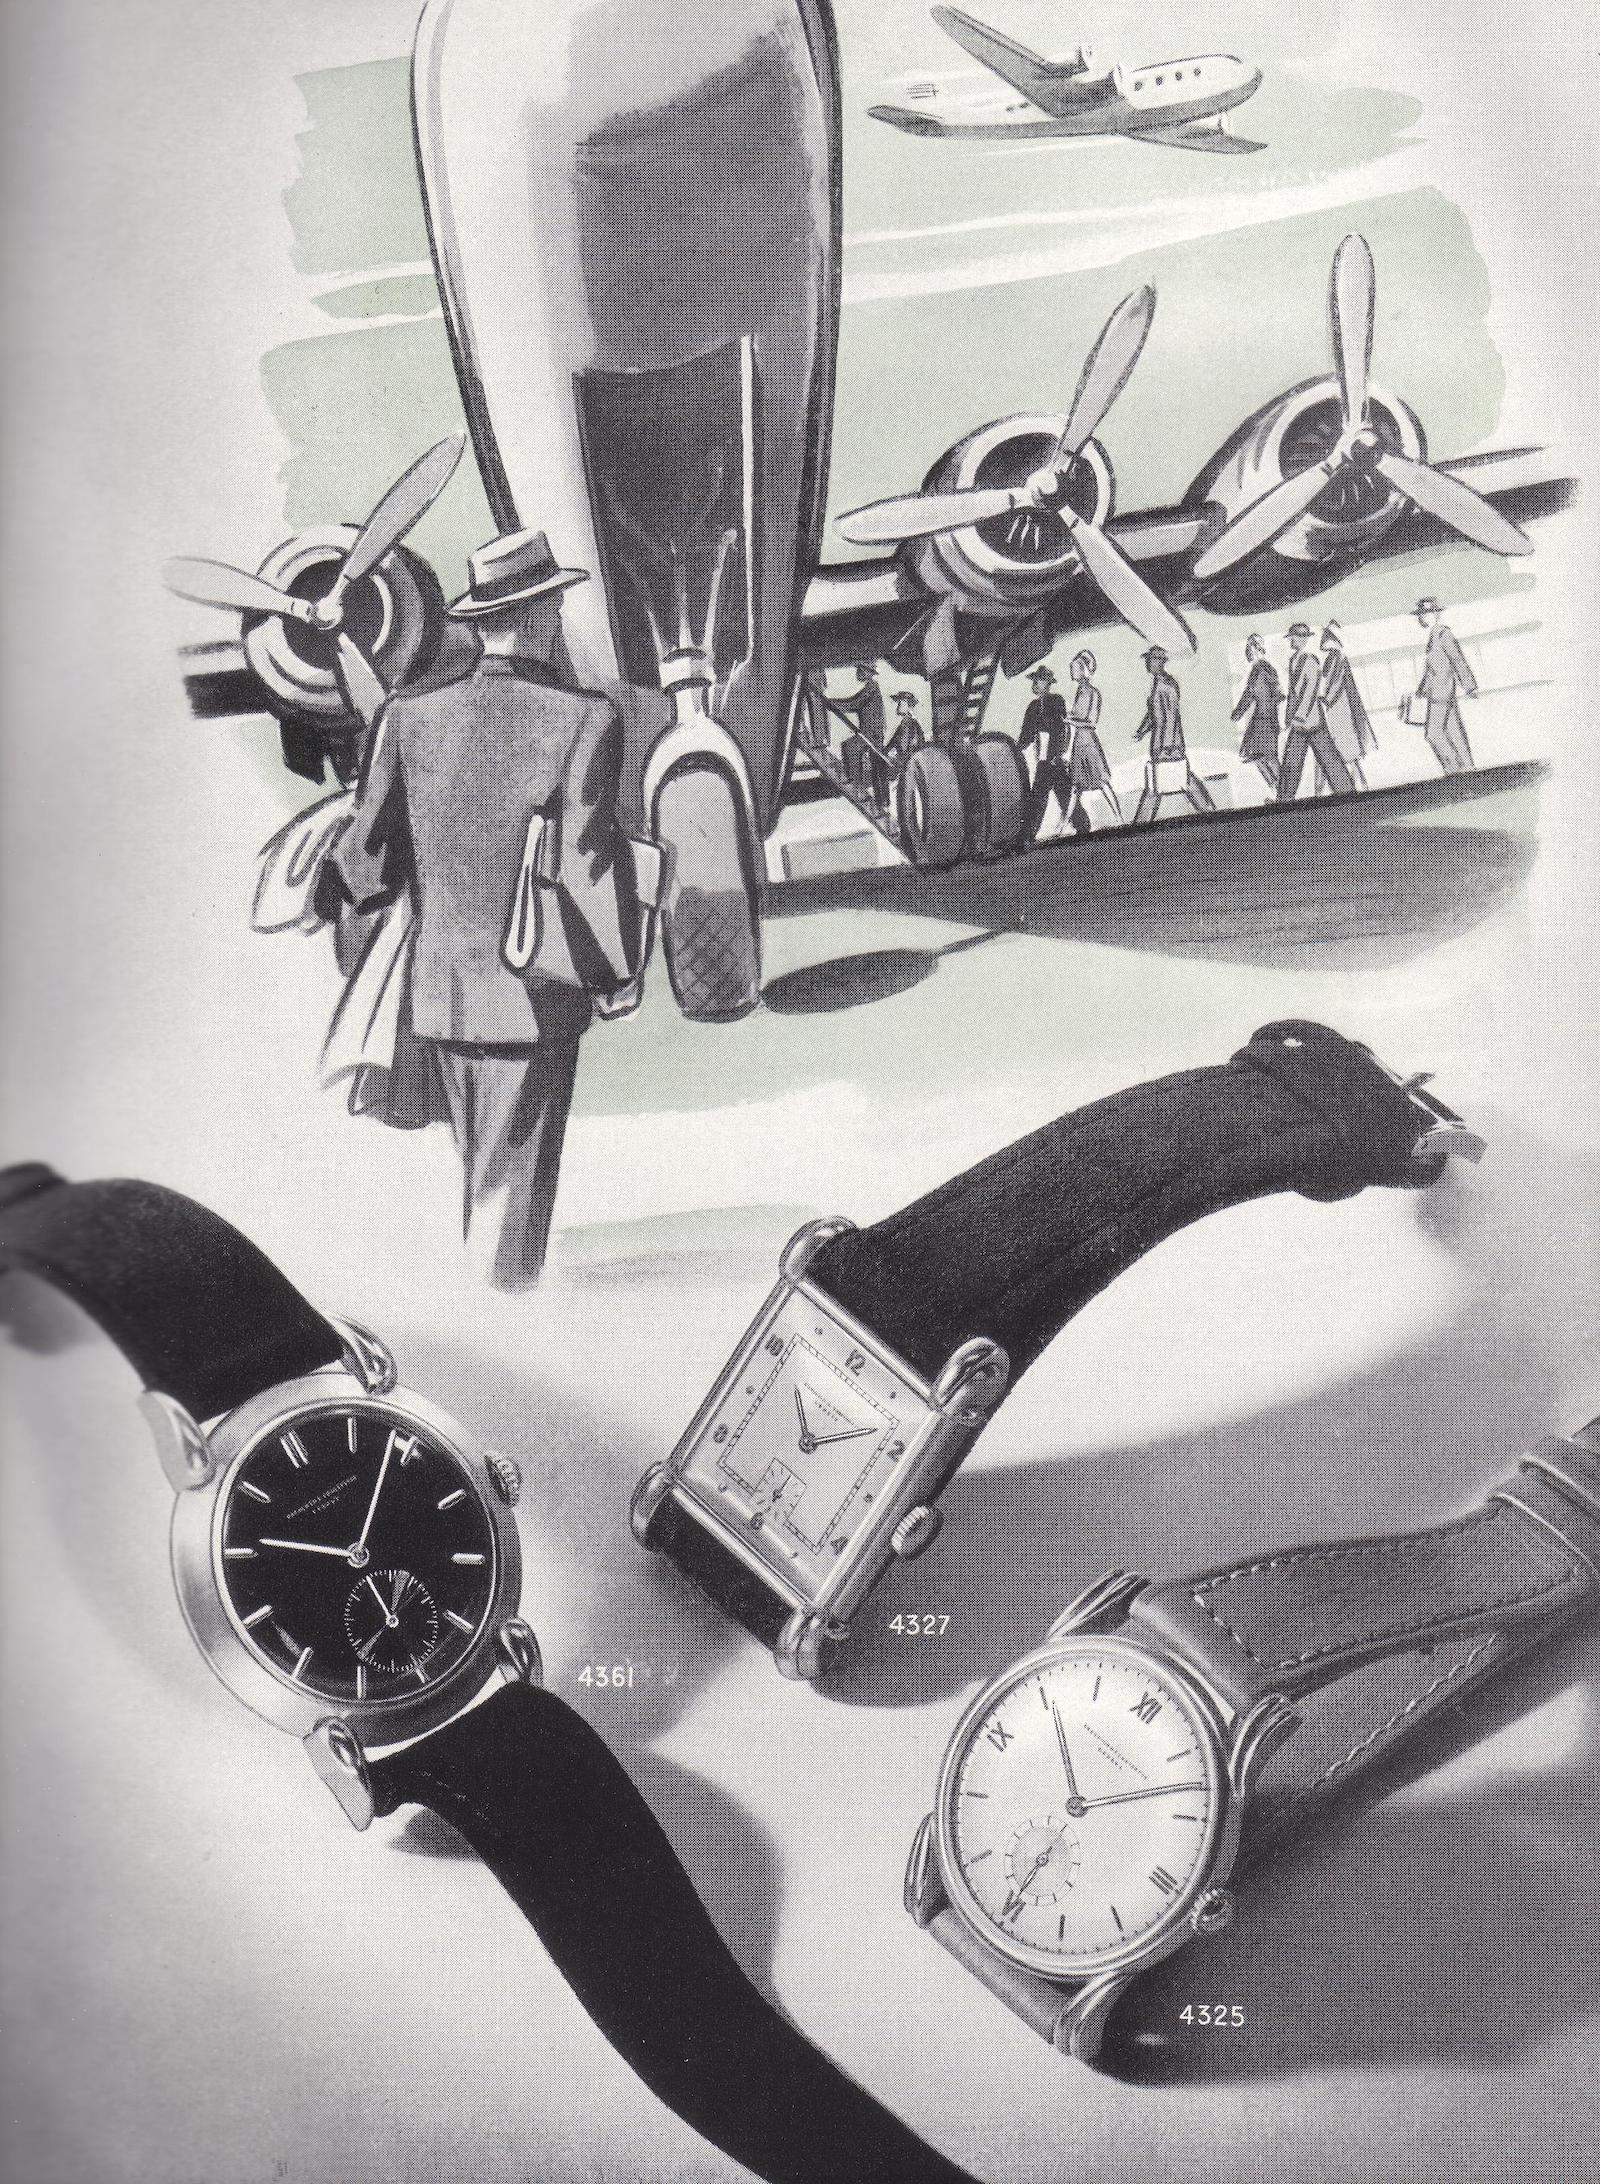 Vacheron Constantin Cornes de Vache Chronograph vintage advert - 1